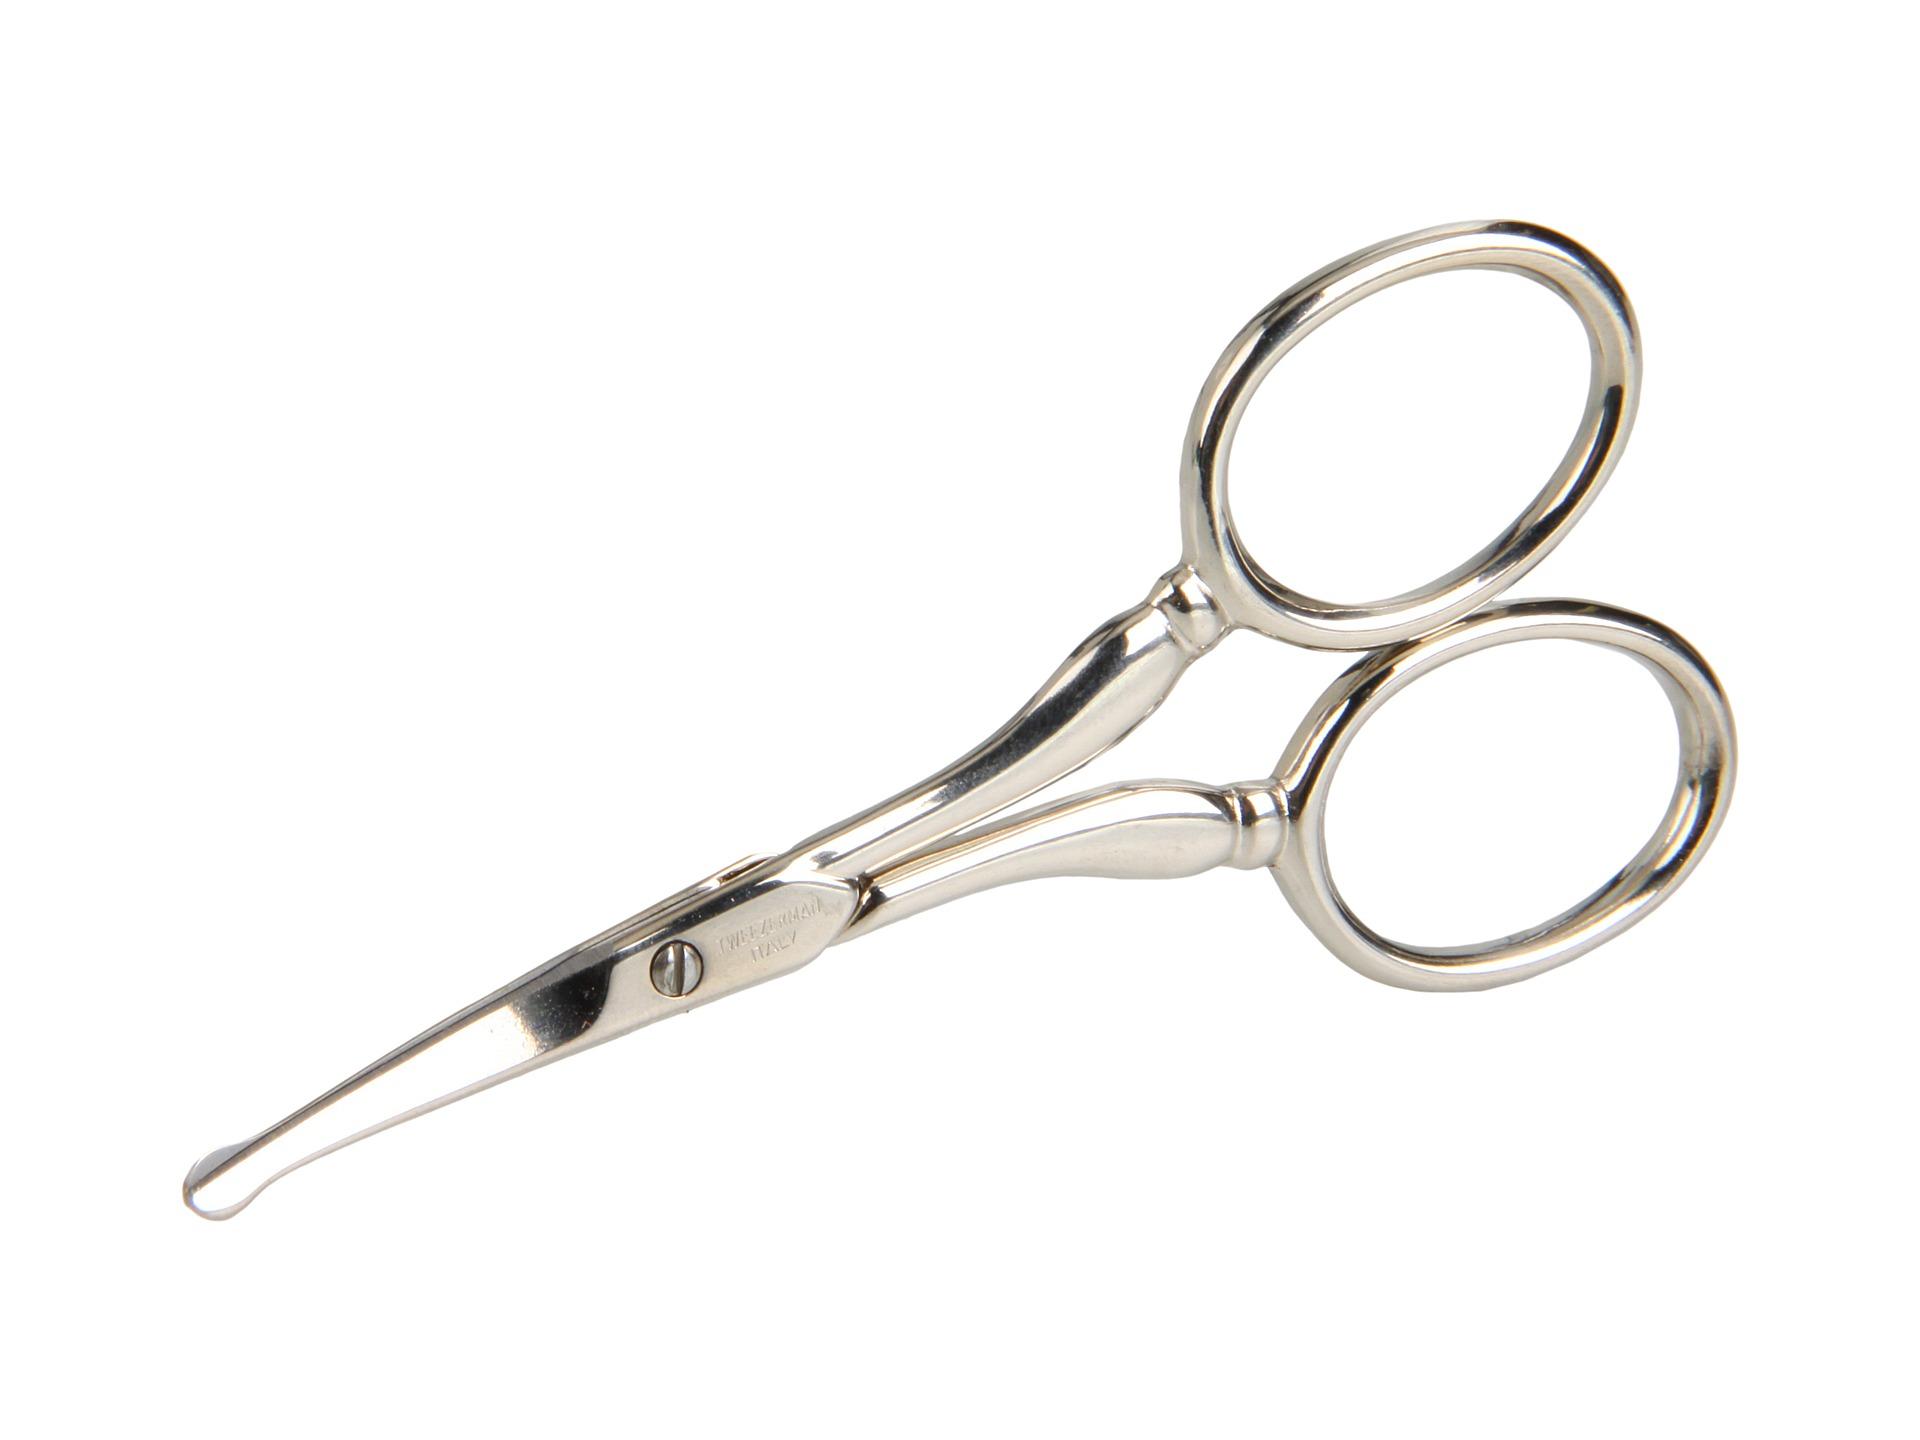 Mens facial hair scissors